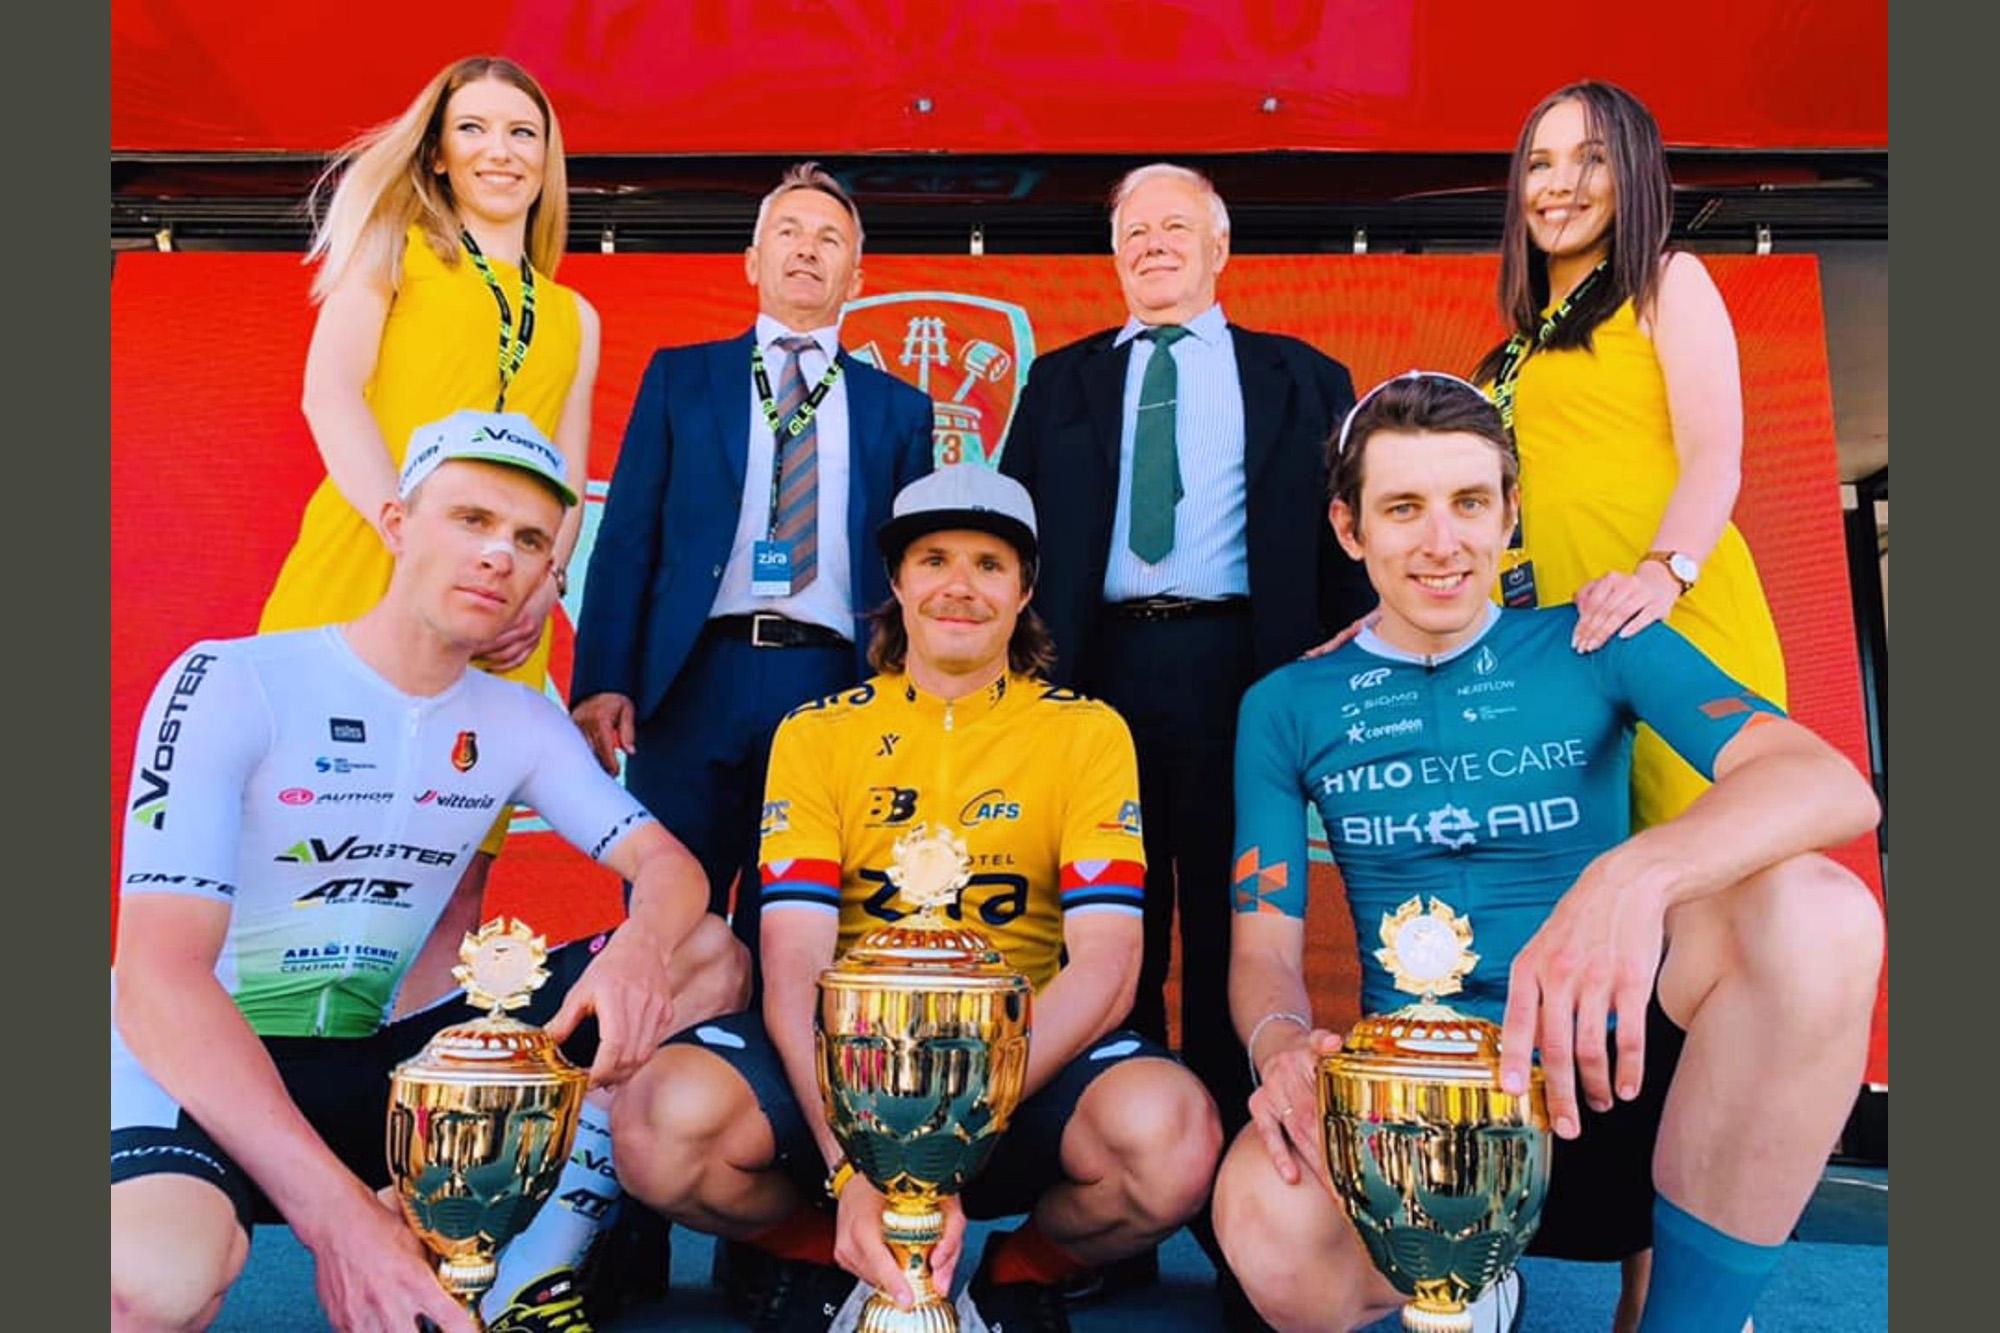 Justin Wolf ทีม BIKE AID และ KAZE RACE | KANSAI 2 คว้ารองแชมป์ รายการ Belgrade Banjaluka 2021 (UCI 2.1)